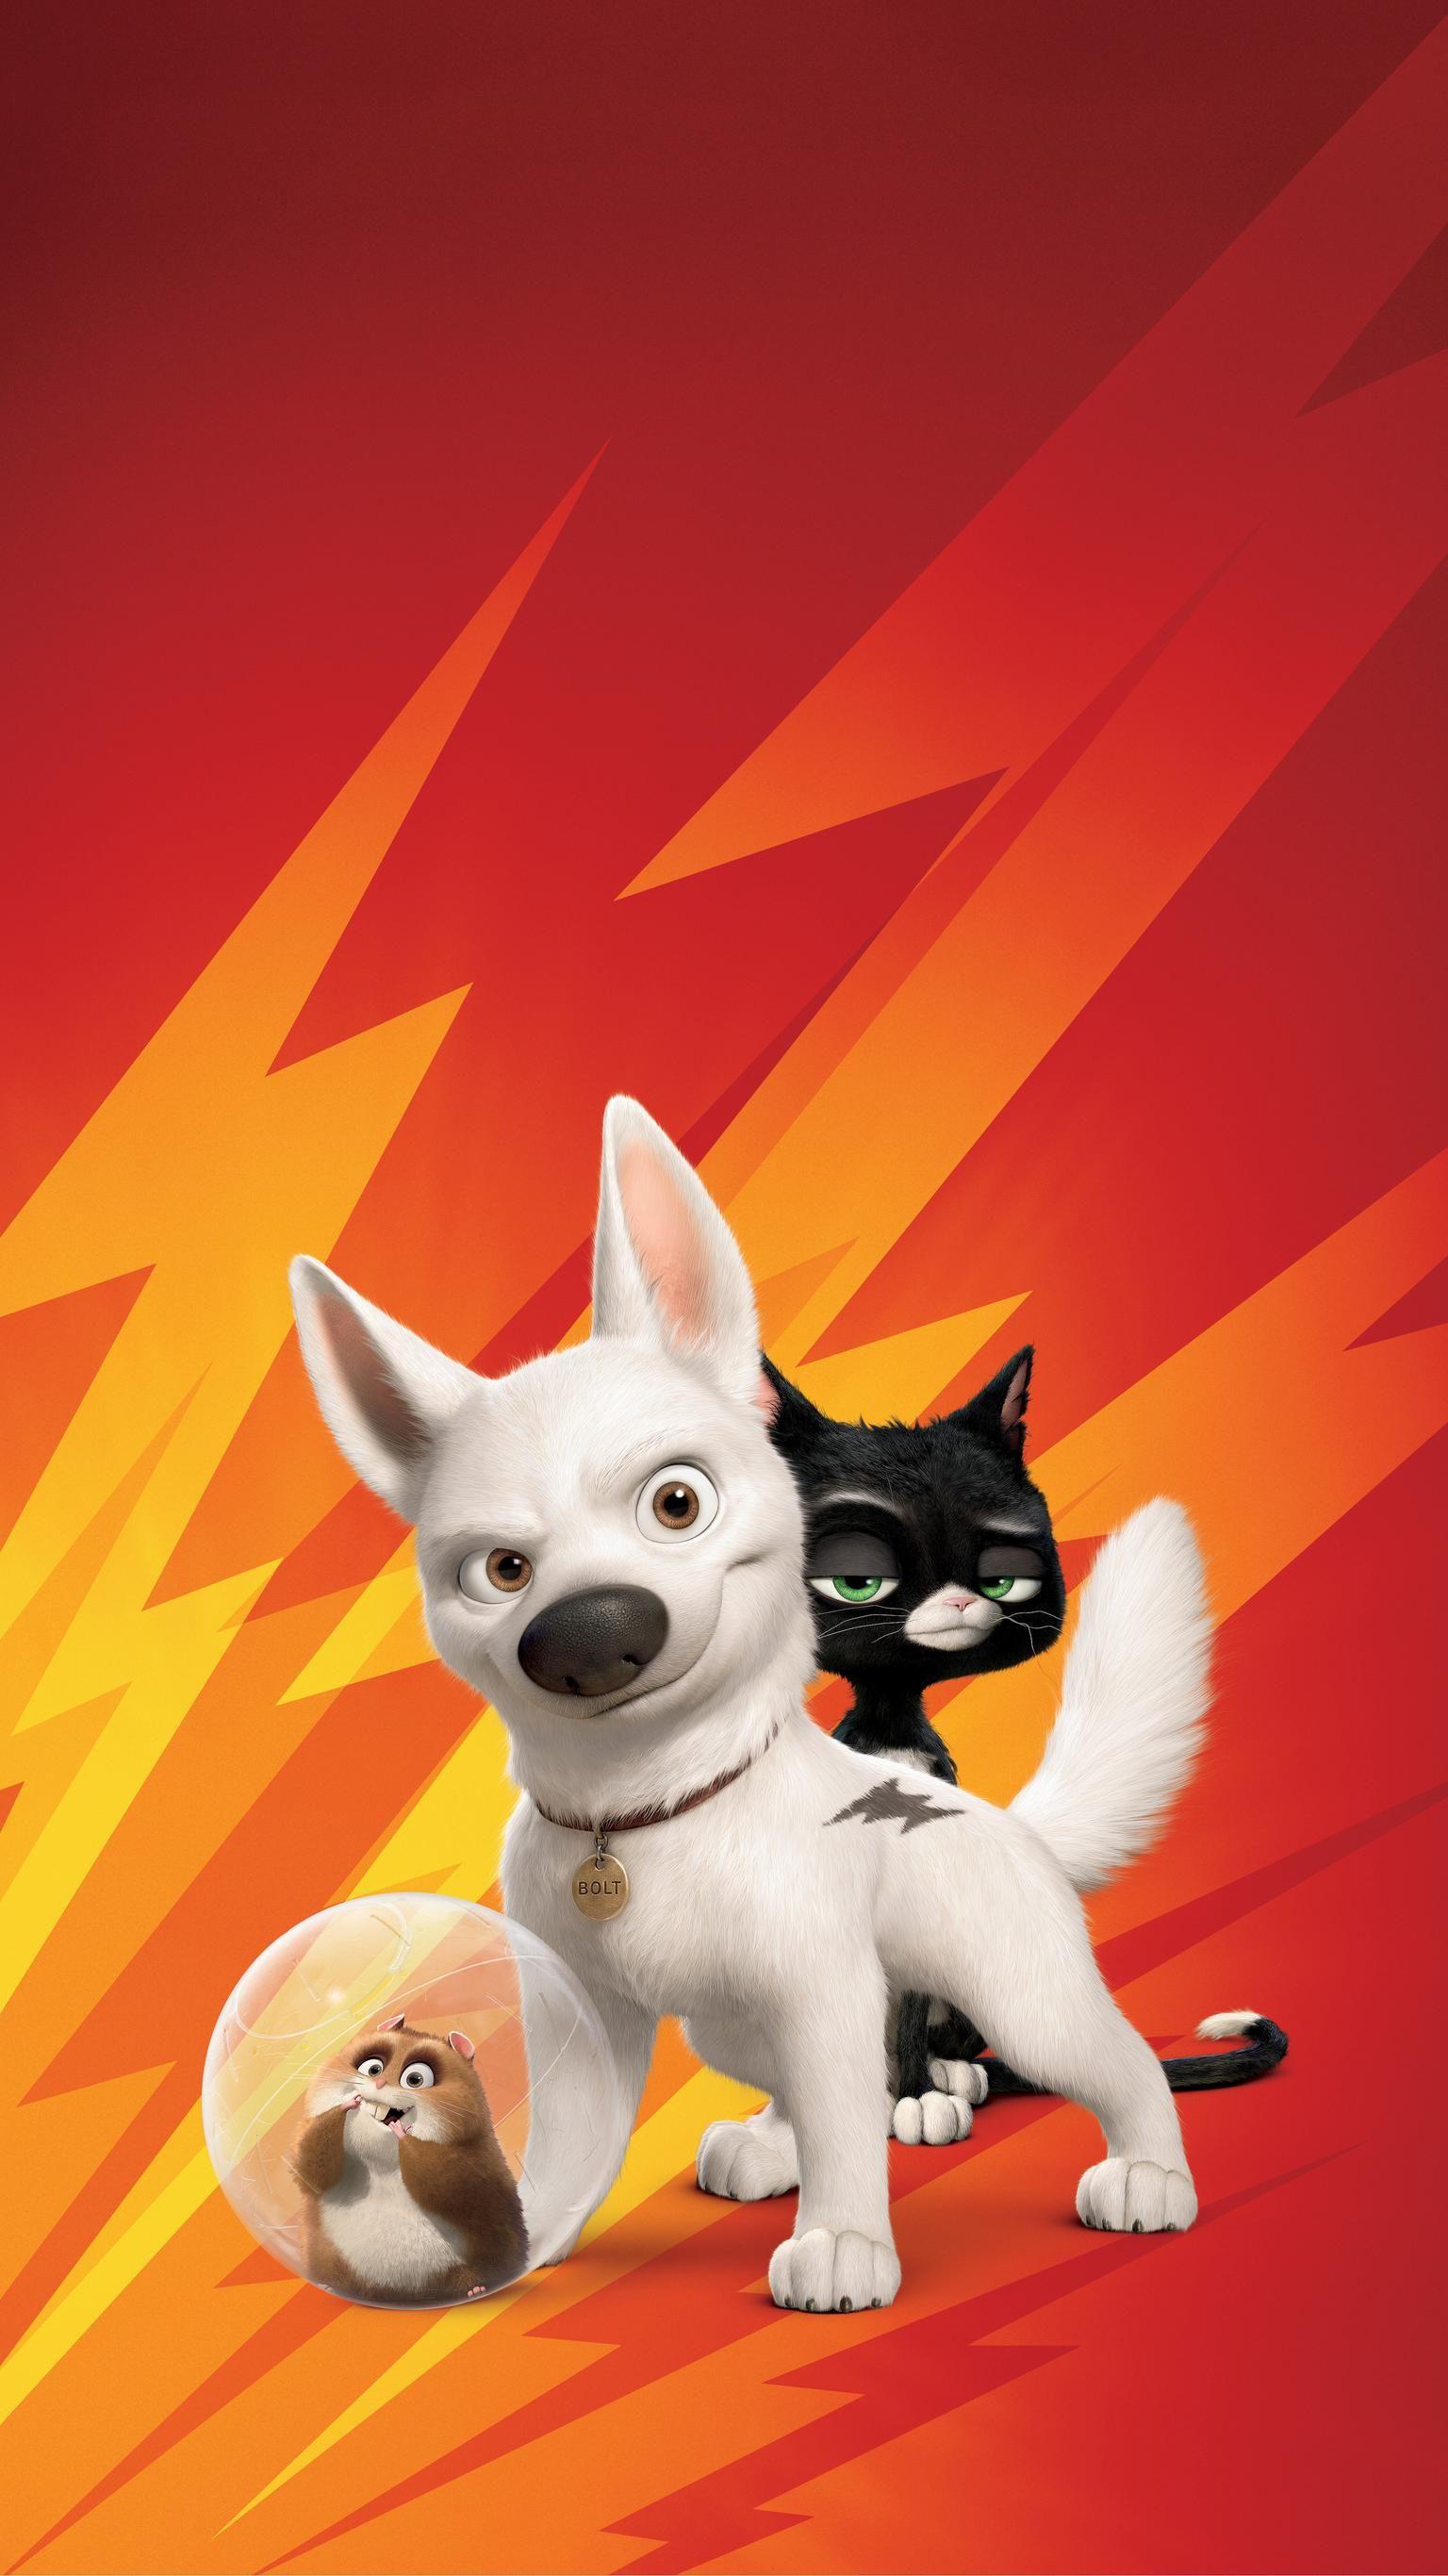 Bolt 2008 Phone Wallpaper Moviemania Bolt Disney Disney Background Disney Images